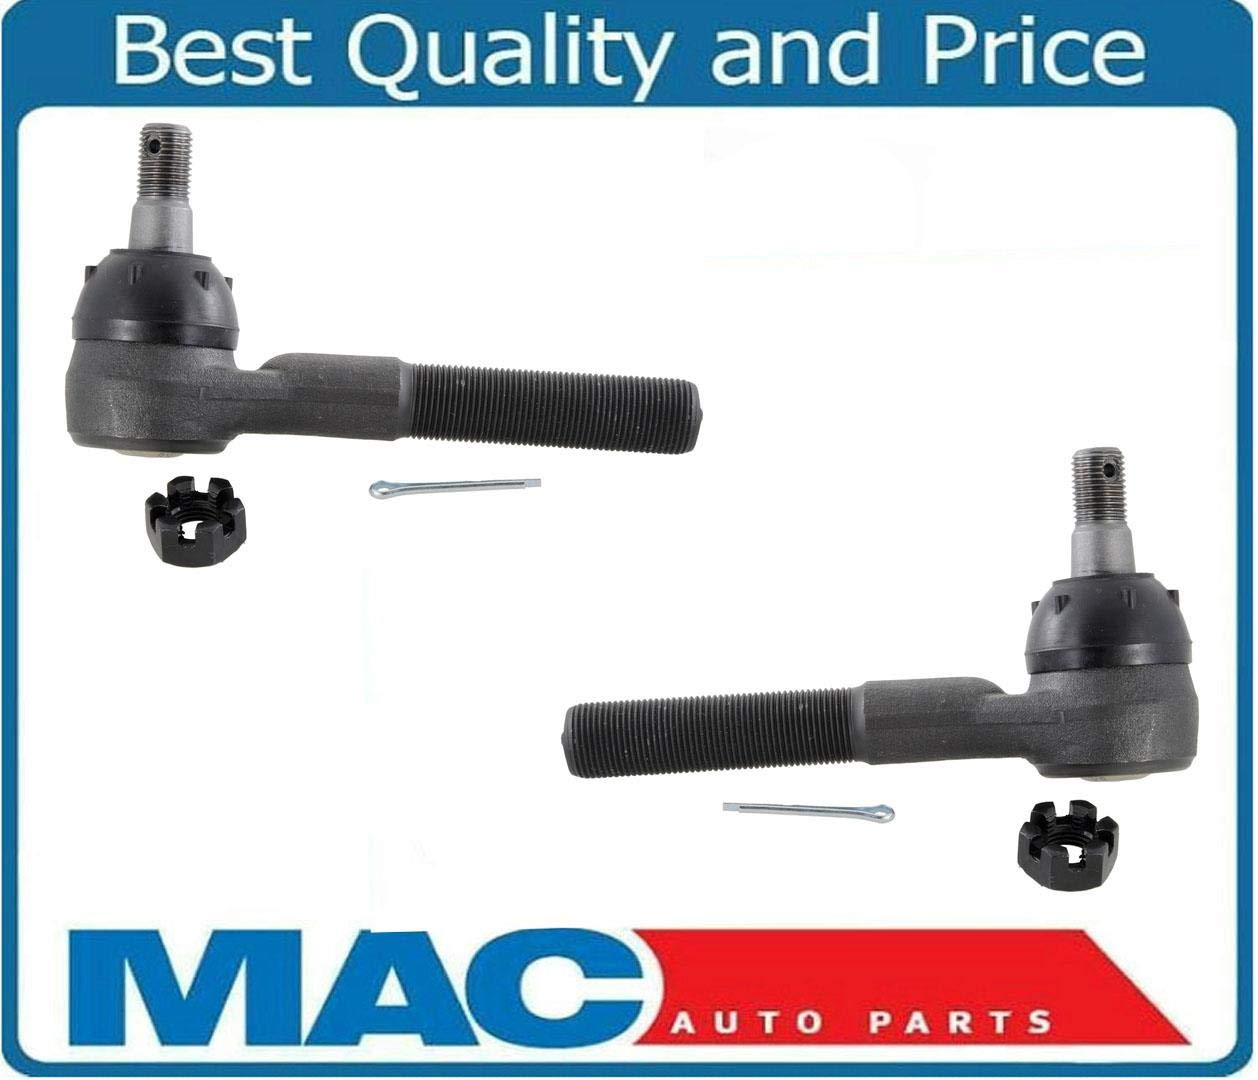 Mac Auto Parts 21879 Ranger F0 F250 F350 2 Outer Tie Rod Rods Ends REF# ES77RT ES78LT 1Pr